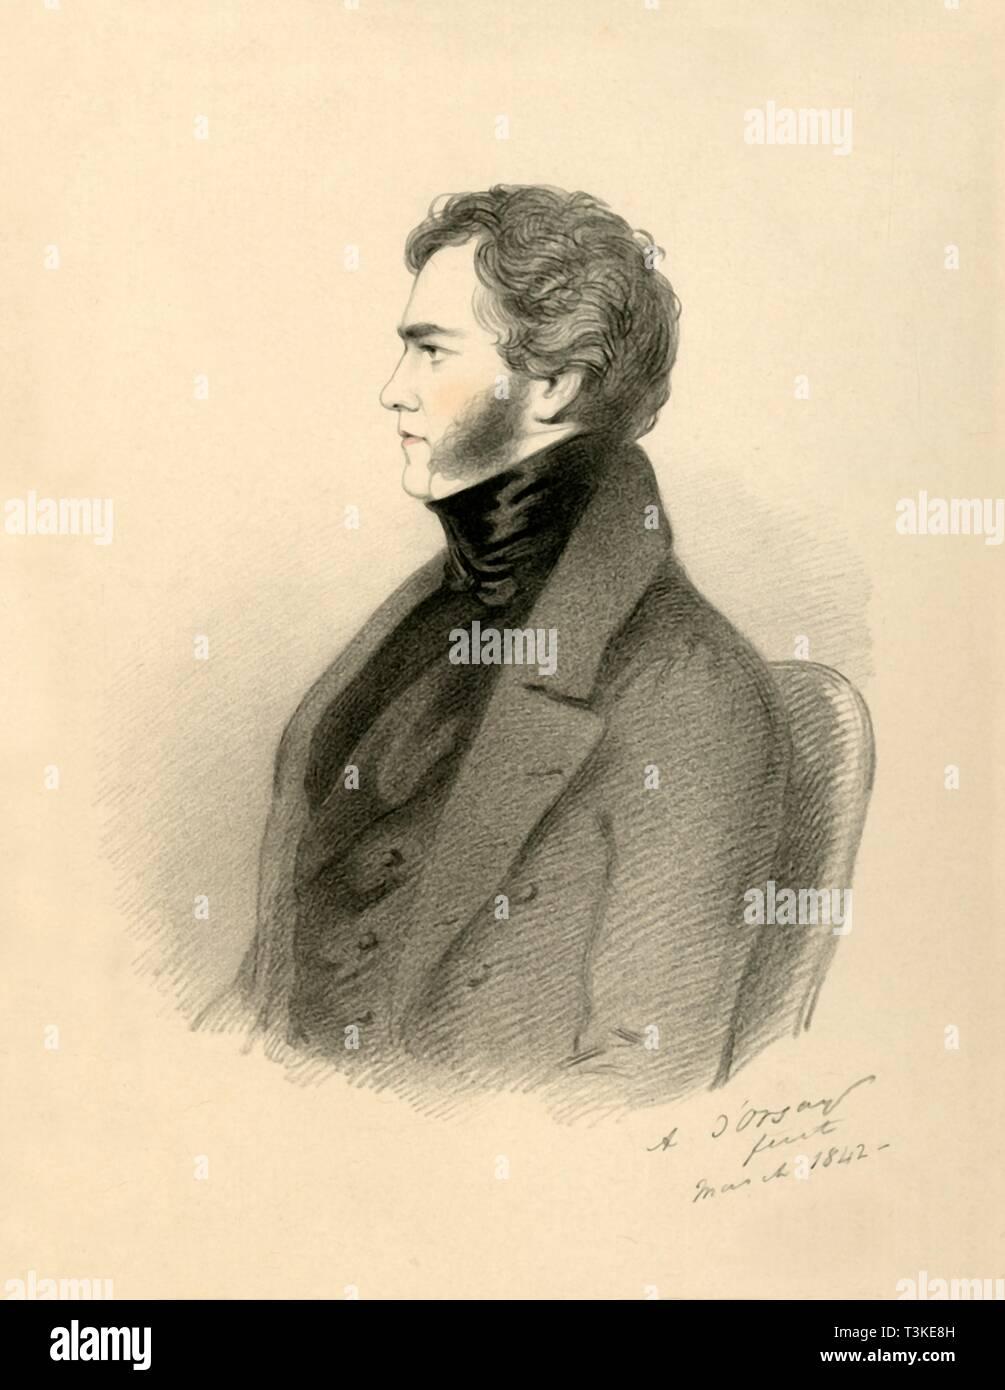 'Admiral Rous', 1842. Creator: Richard James Lane. - Stock Image